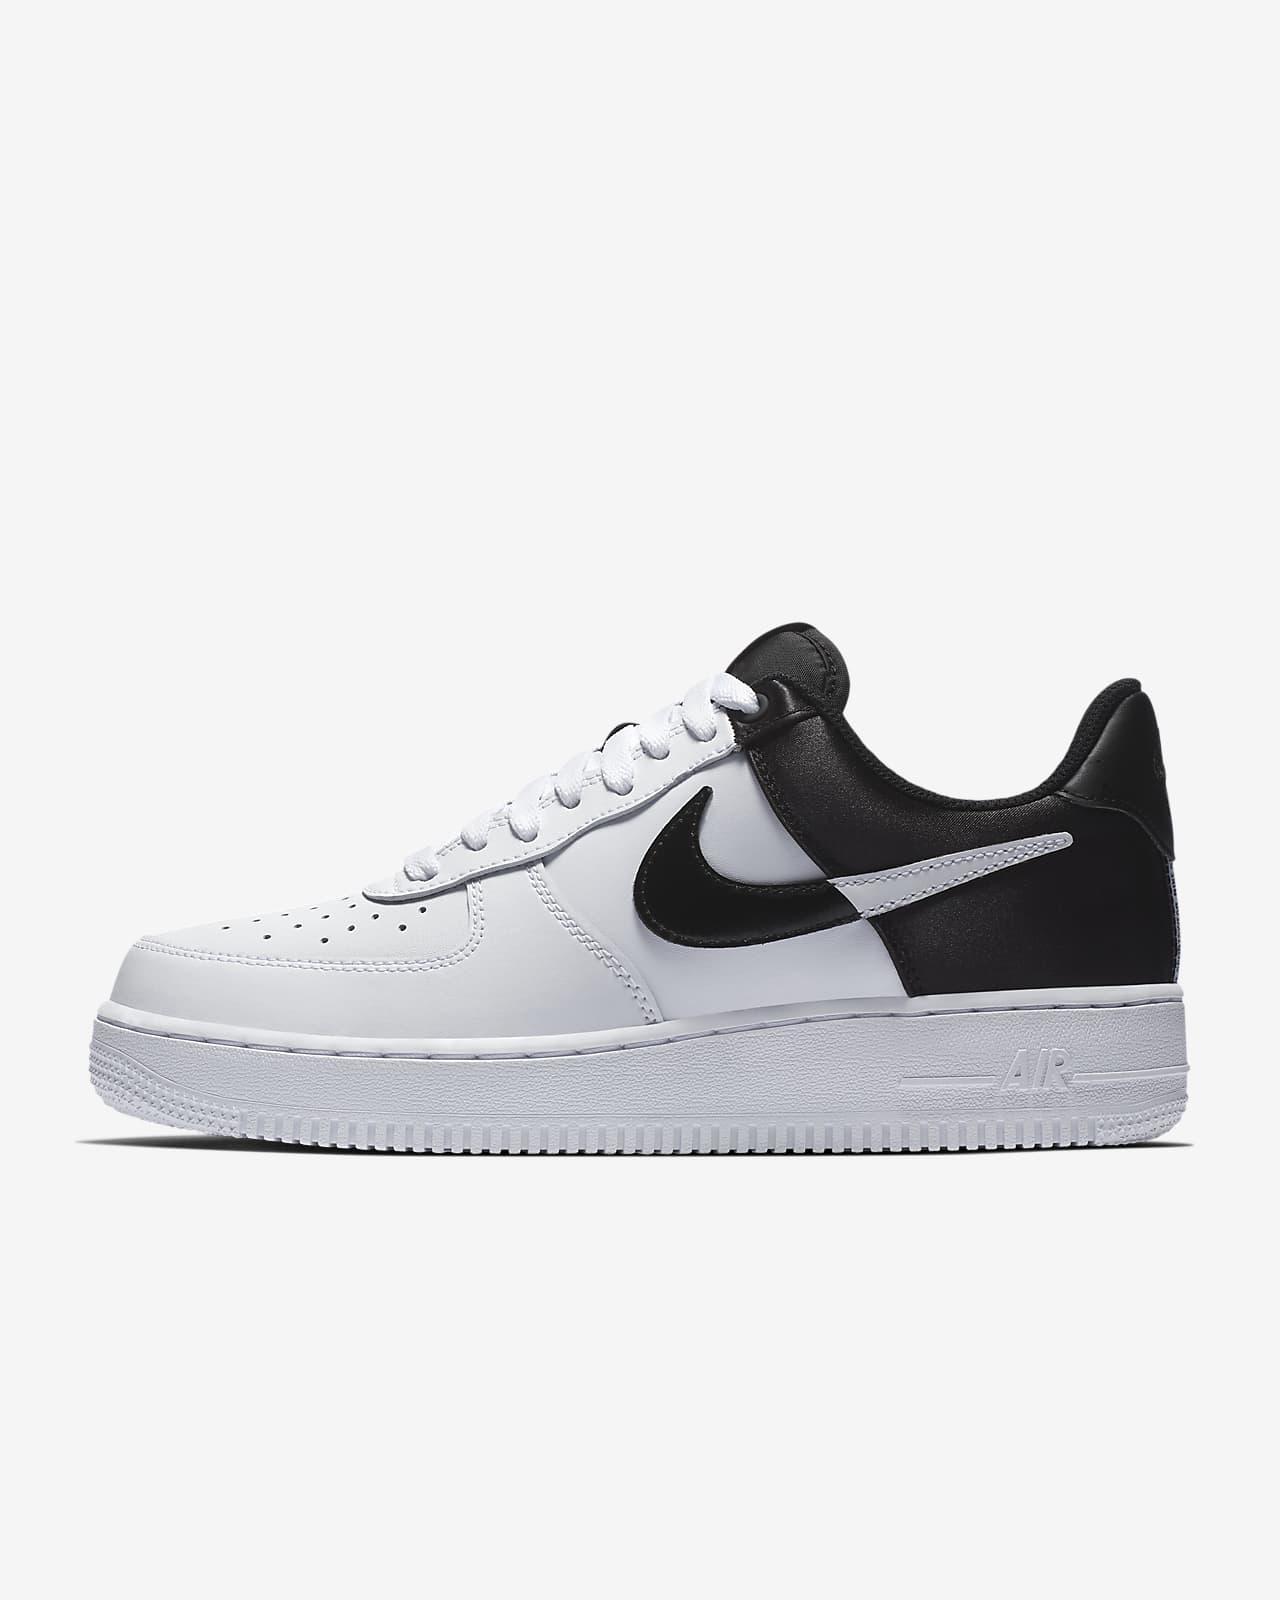 scarpe nike air force one 1 low 07 nba white